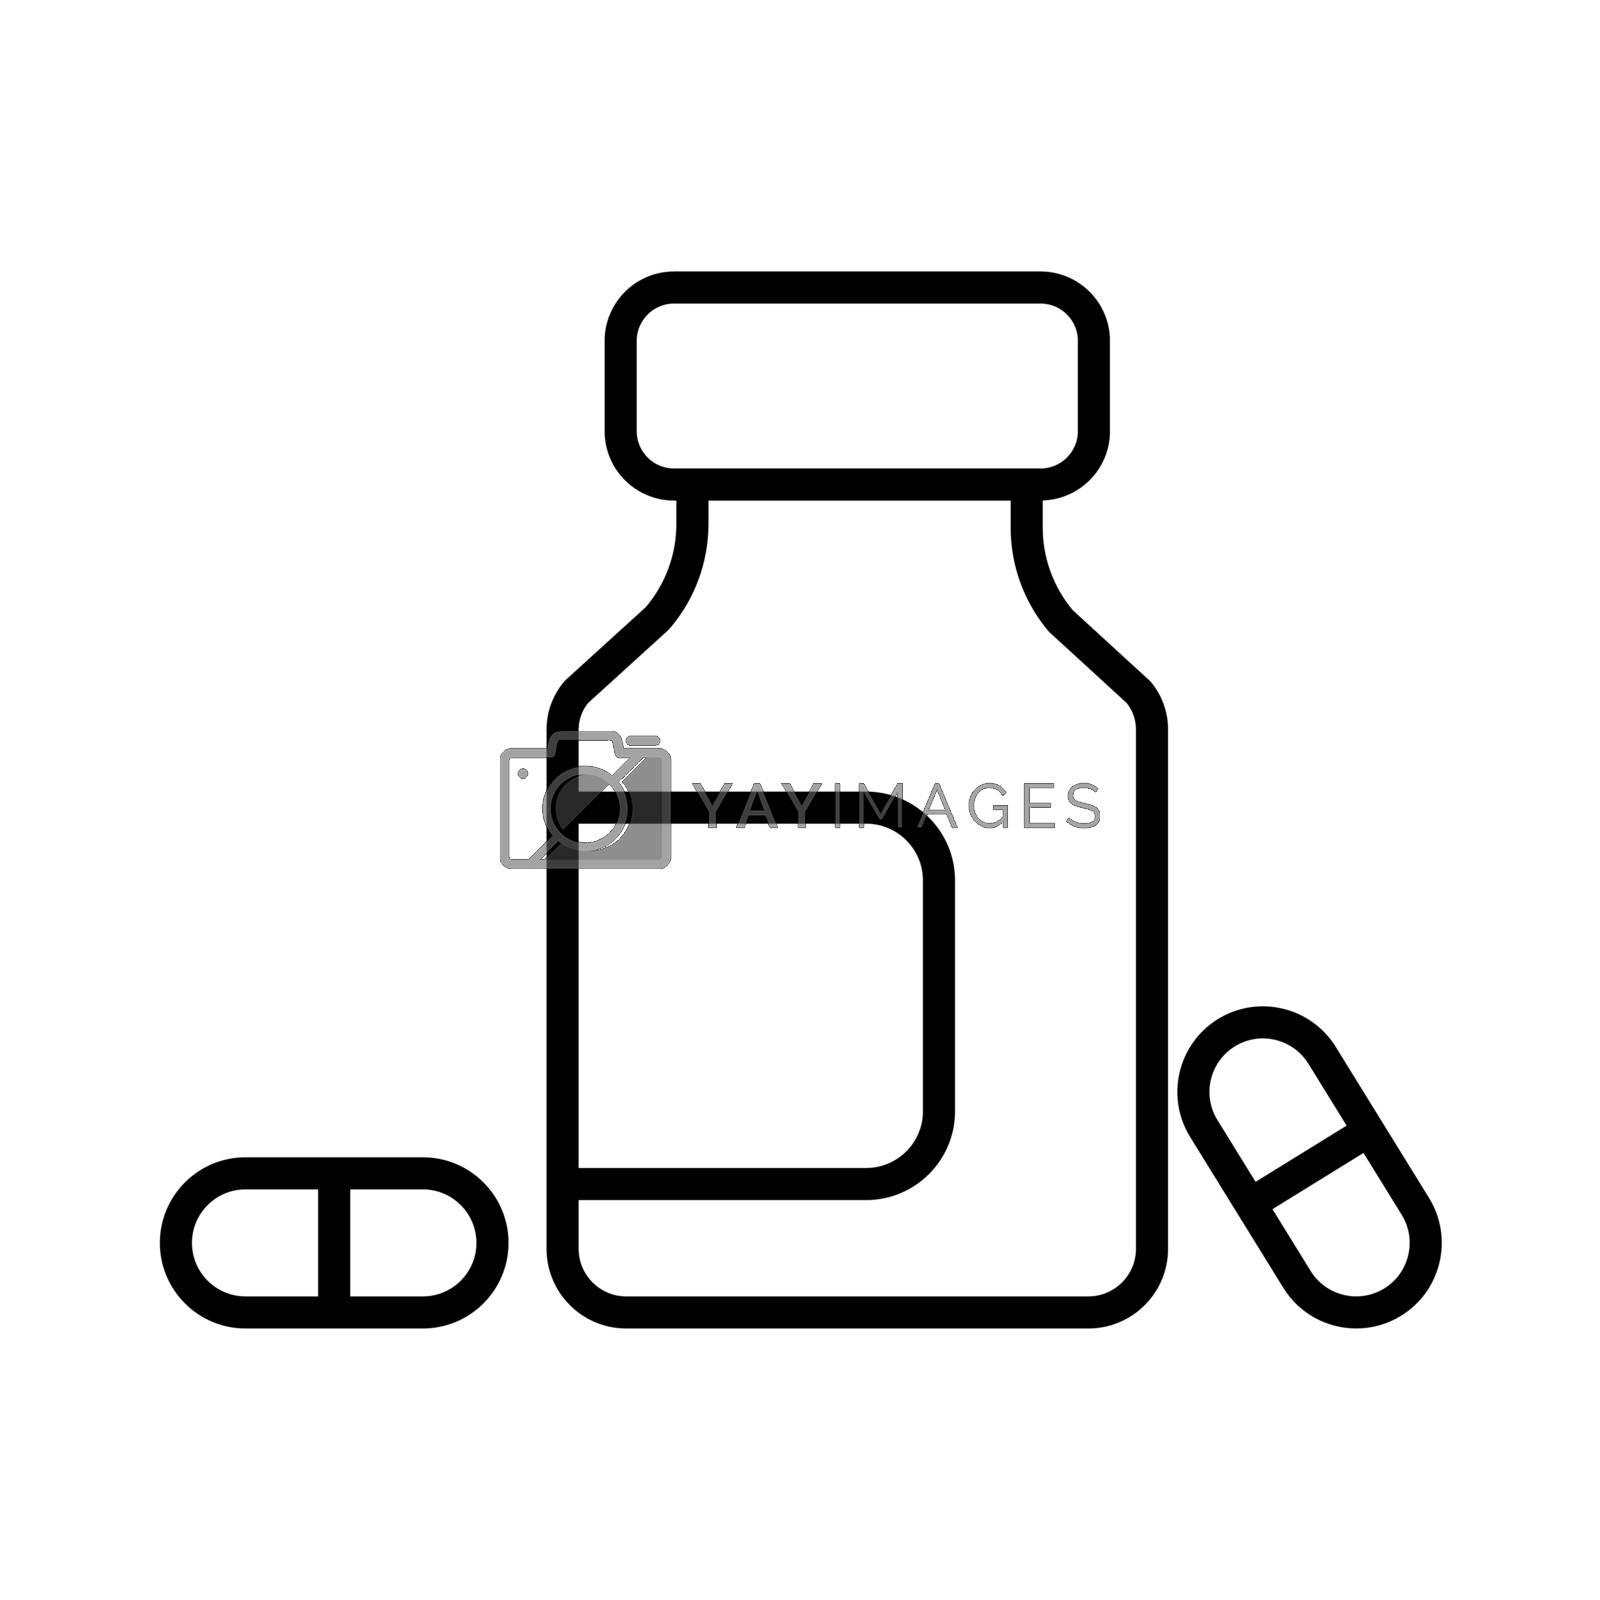 Medicine bottle and pills vector icon. Medicament. Medicine and medical support sign. Graph symbol for medical web site and apps design, logo, app, UI